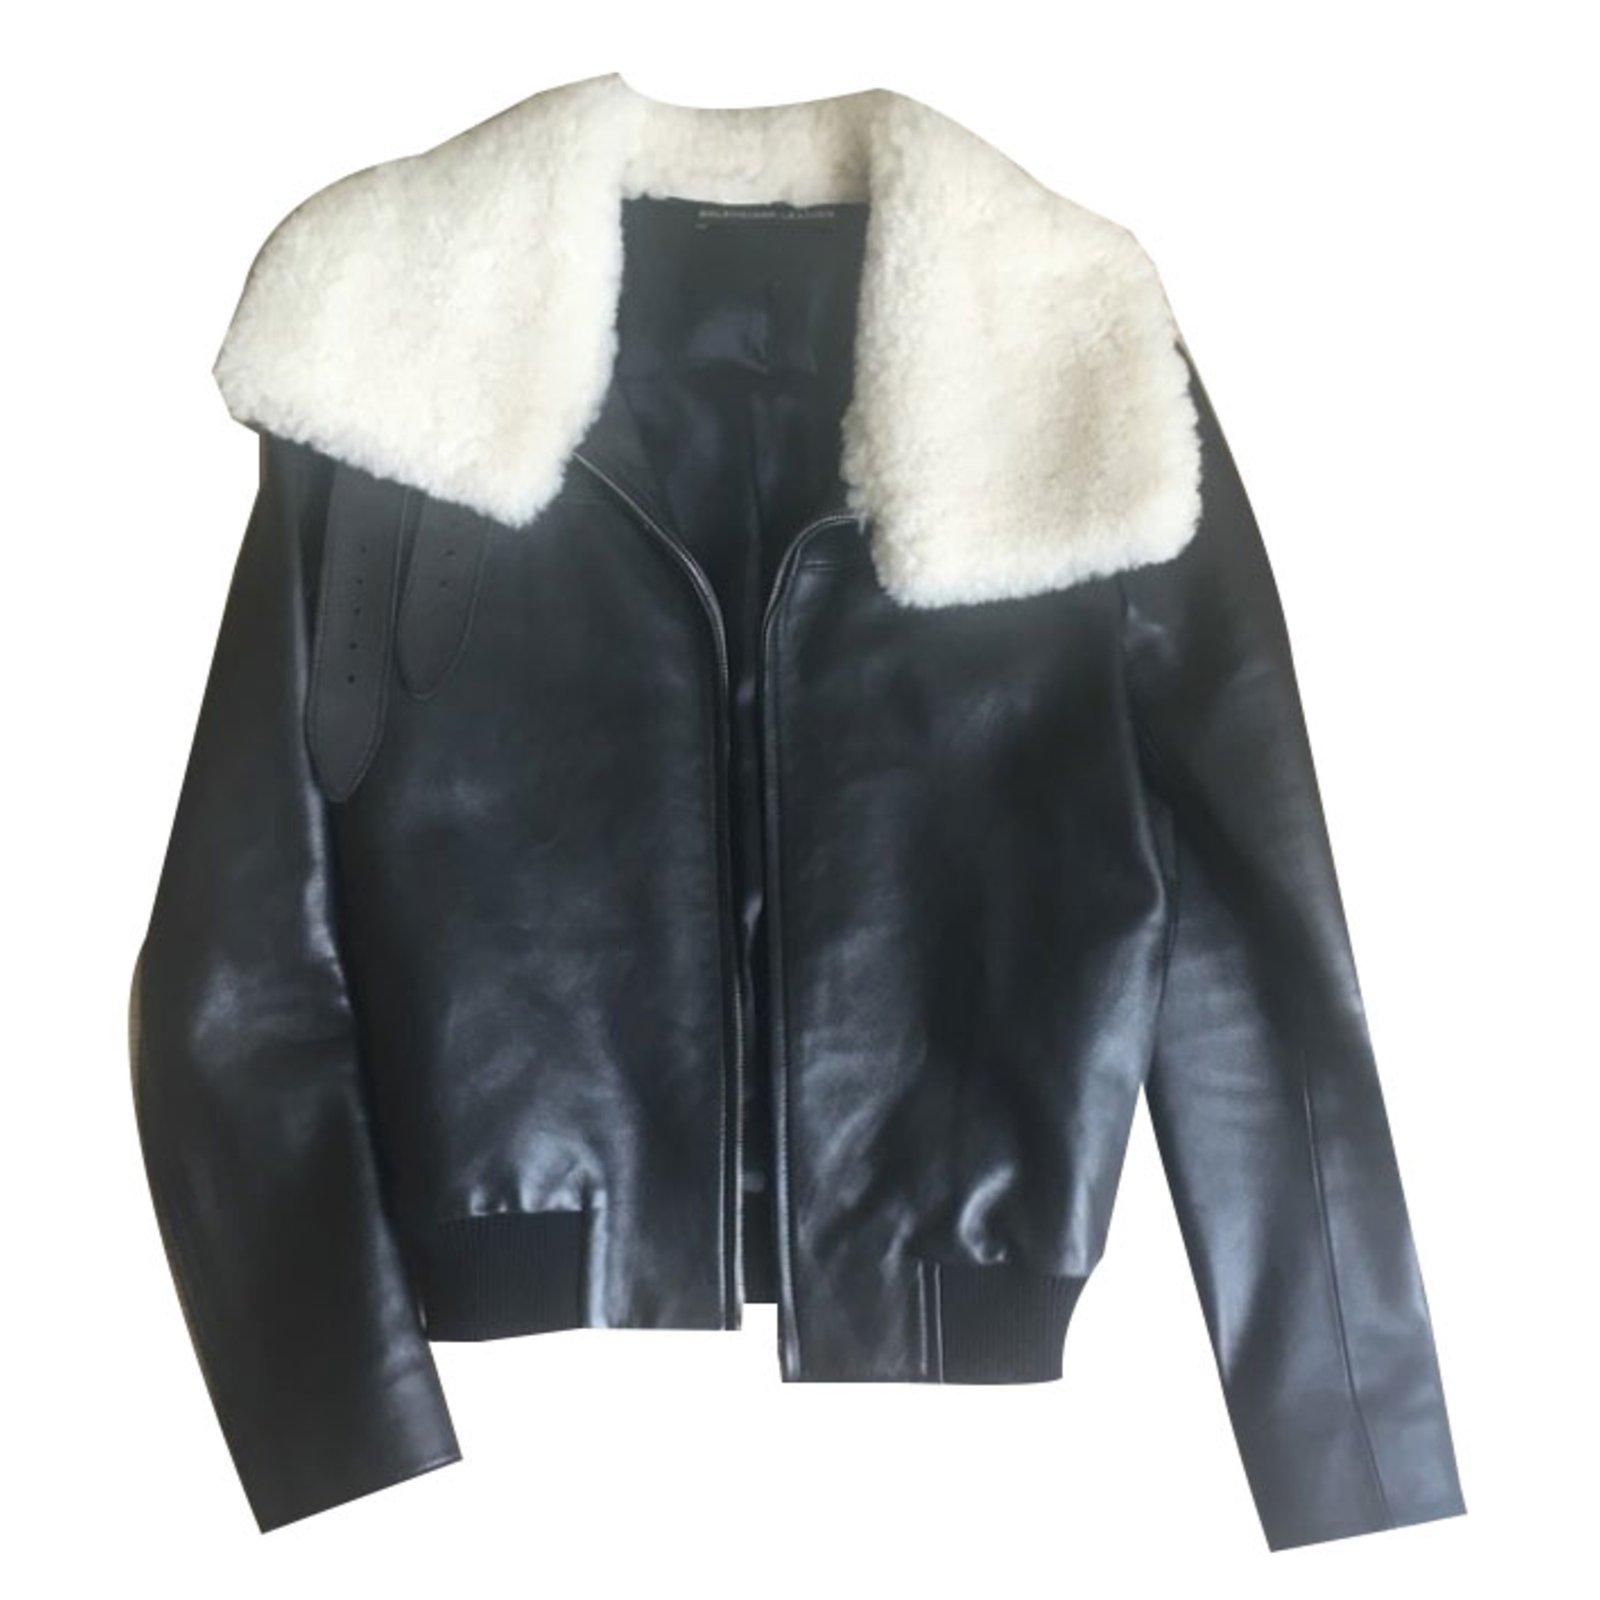 Laine 67304 Joli Vestes Balenciaga D'agneau cuir Noir Ref g71wZwfqT